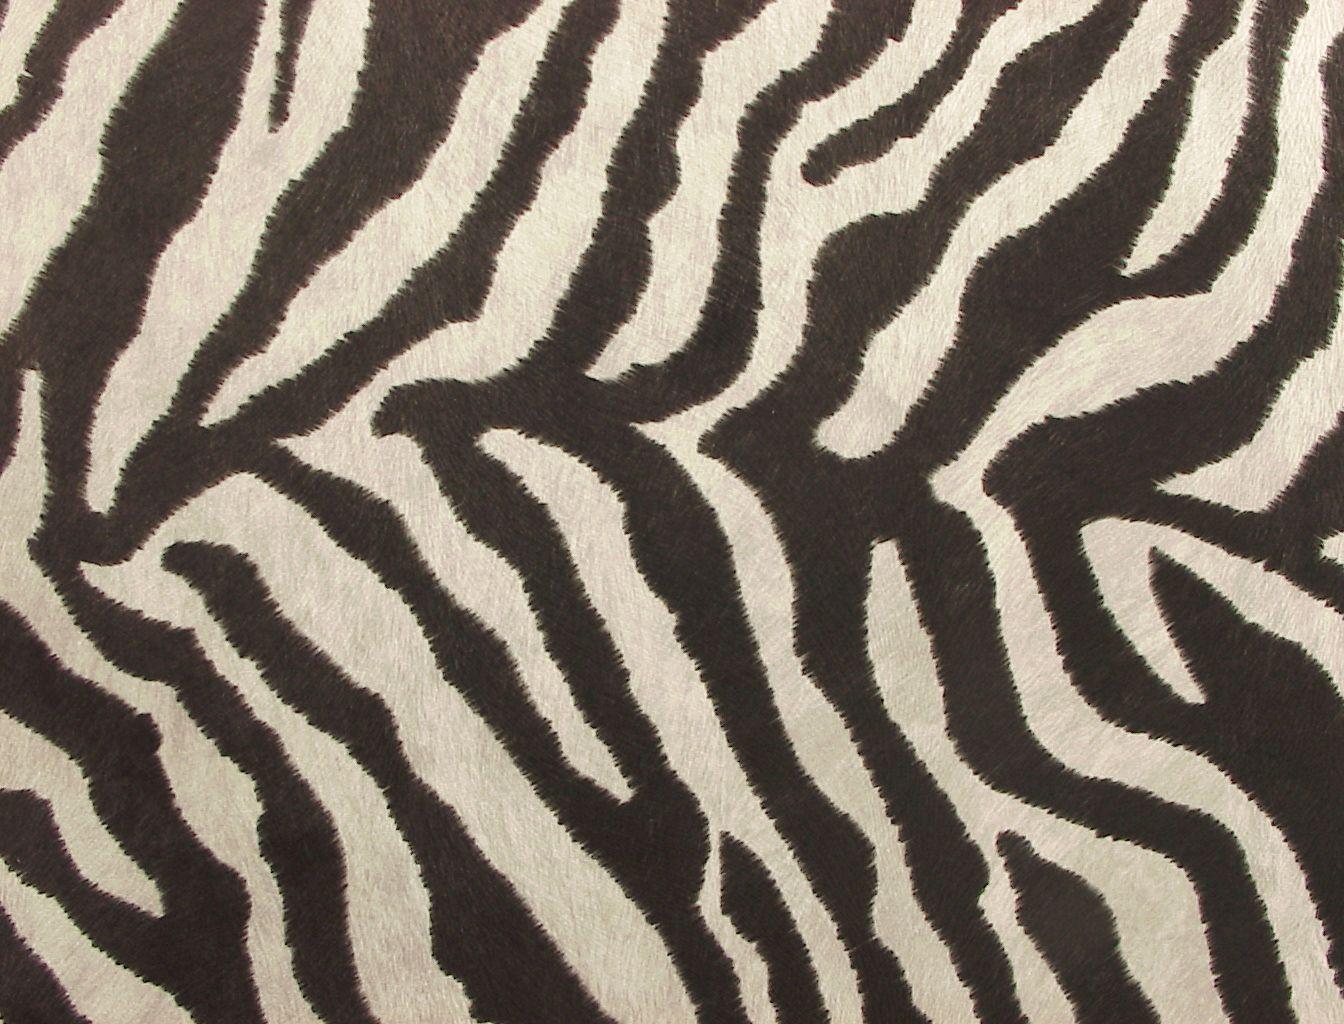 zebra print upholstery fabric tub chair design | Zebra faux hide upholstery animal skin fabric | Fabric ...